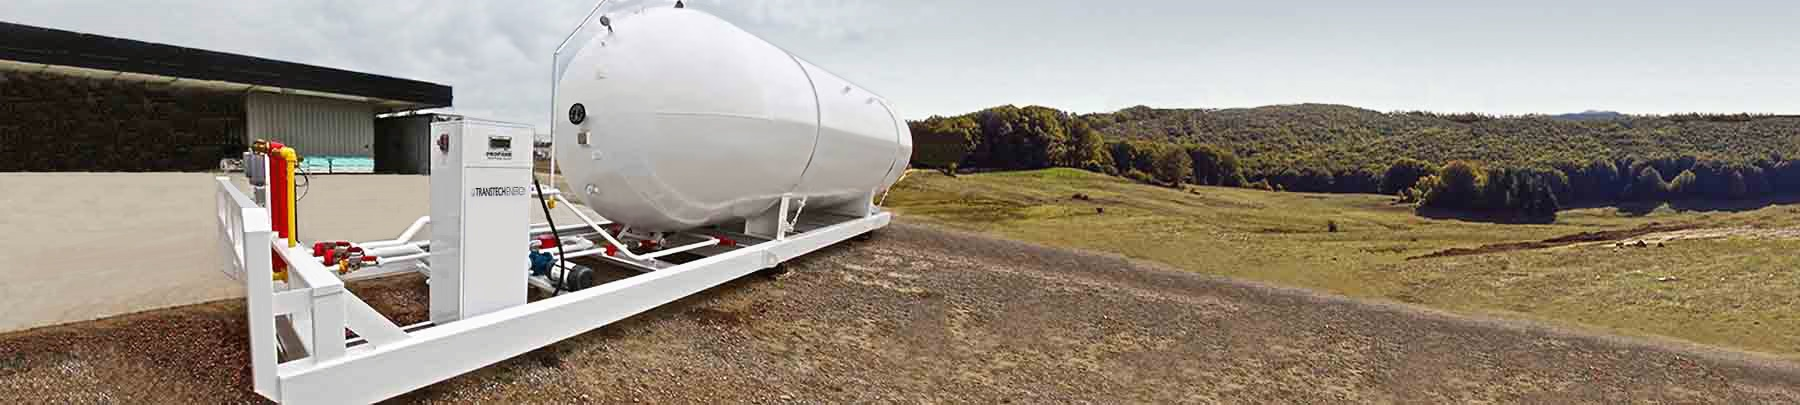 Propane Autogas Fuel Dispensers - Dispensing Infrastructure.jpg